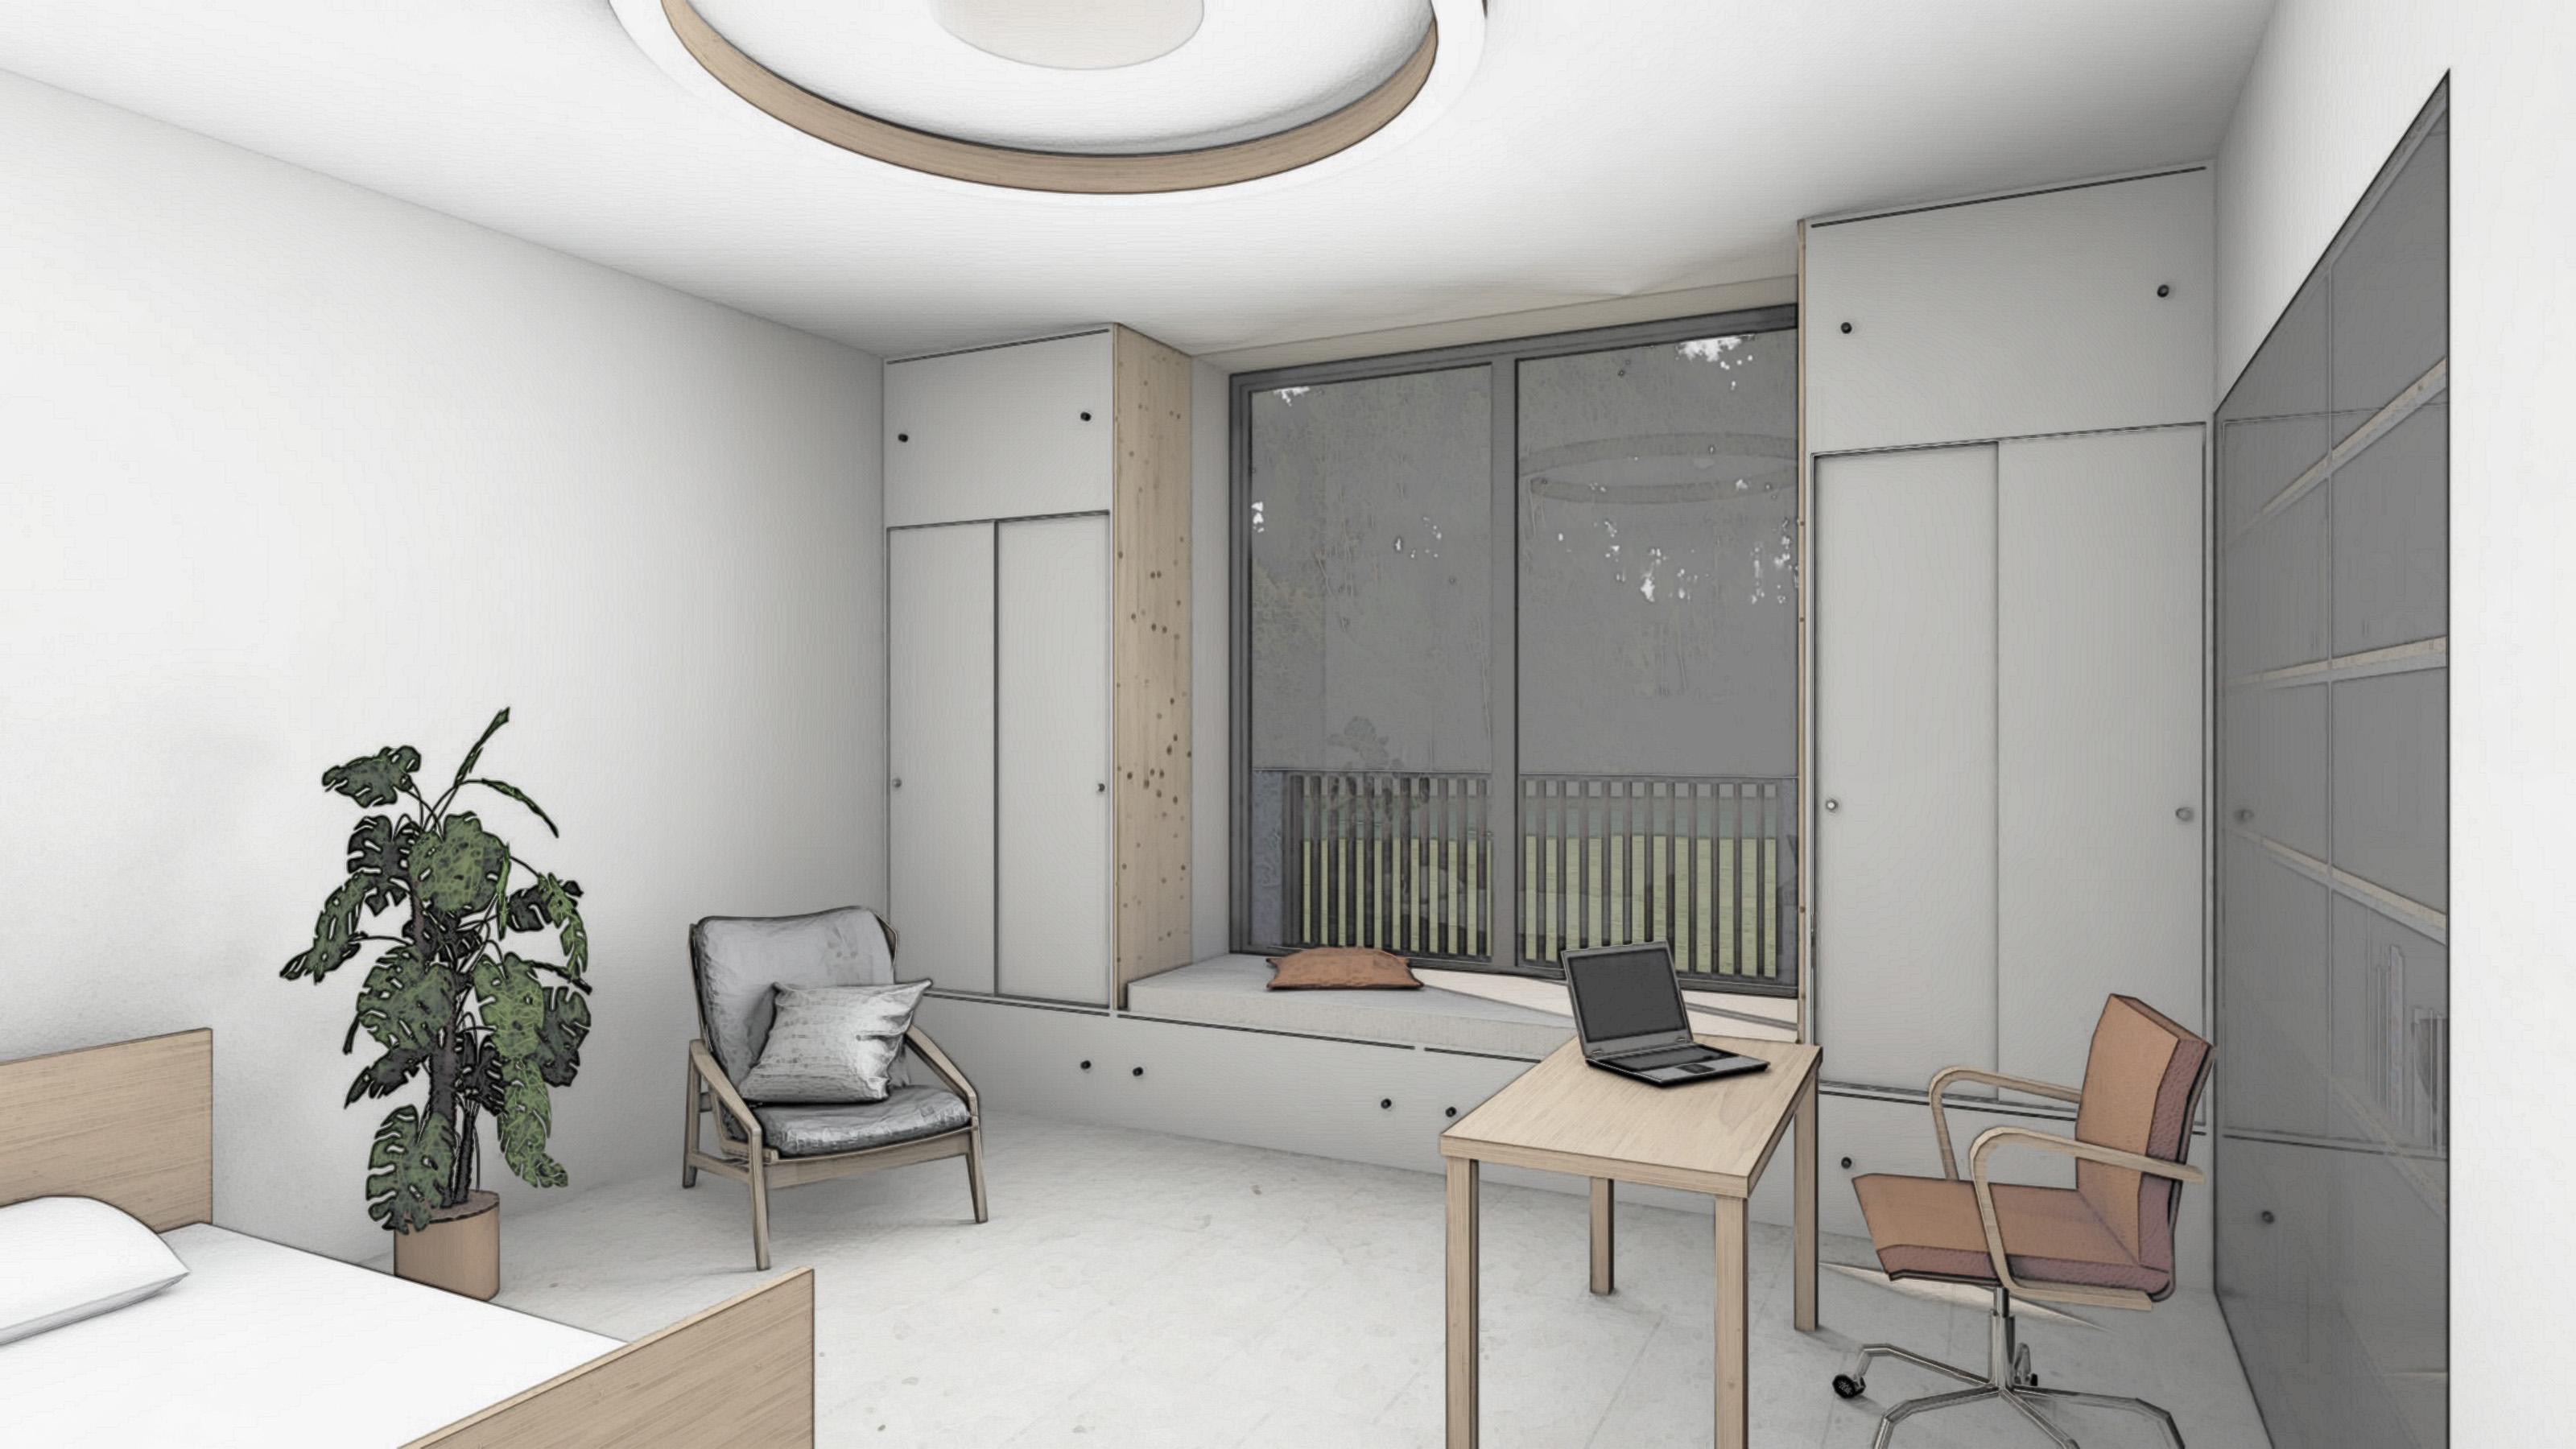 Изображение для проекта Проект особняка в Латвии в стиле модерн 2900